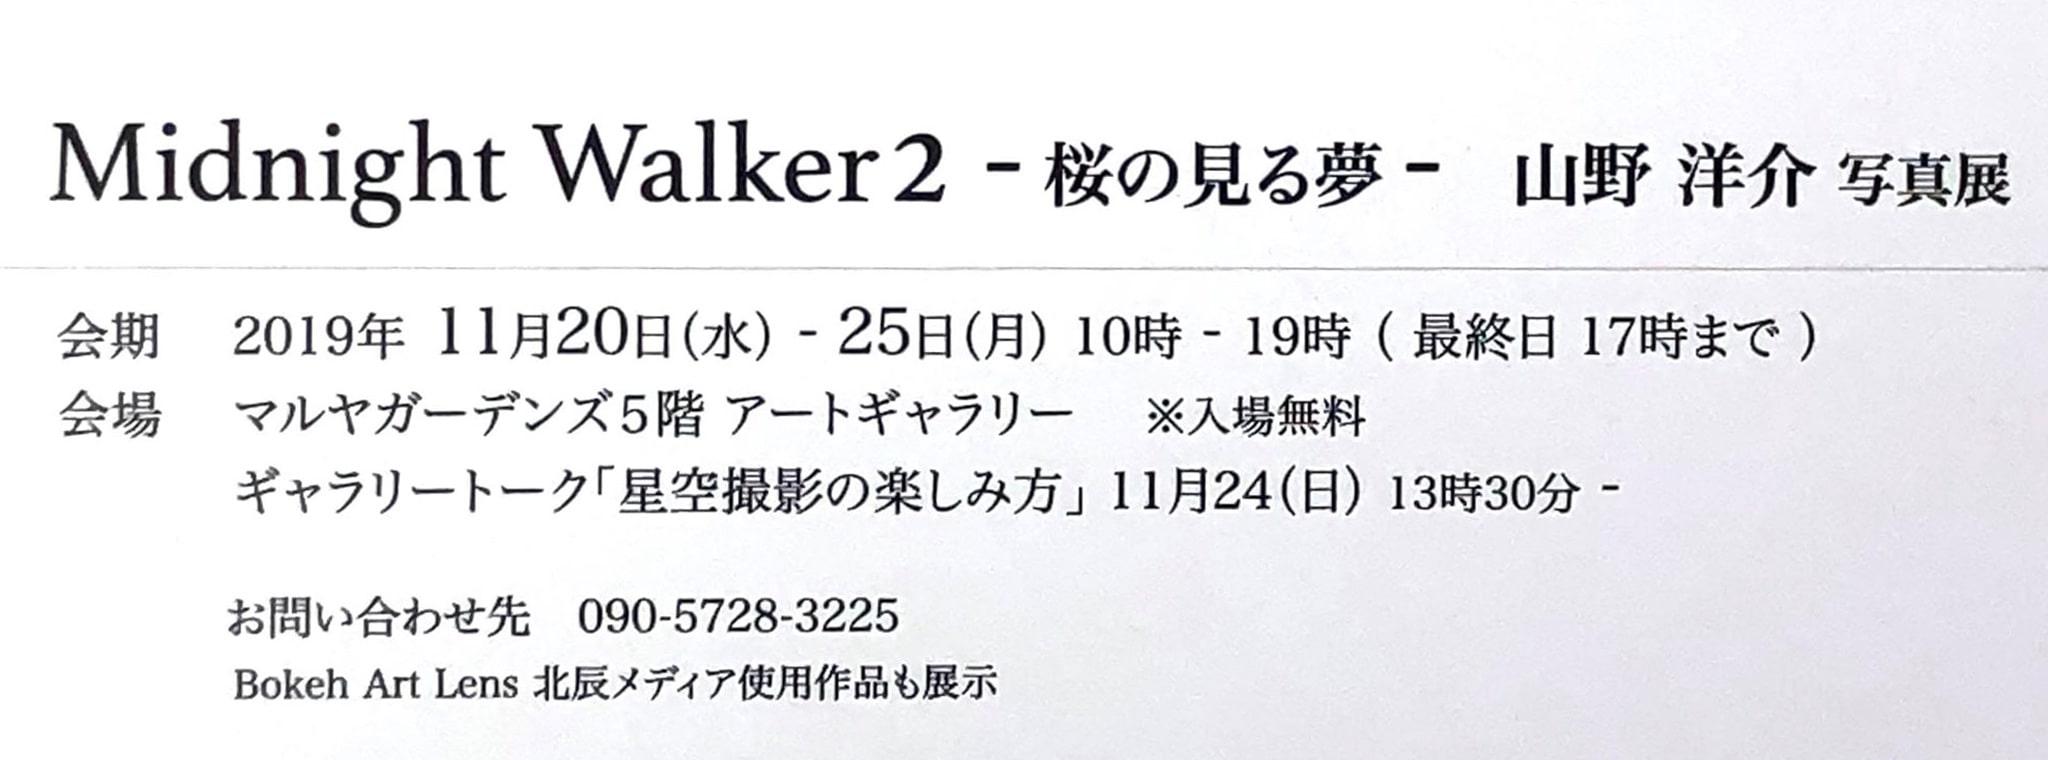 Midnight Walker2 -桜の見る夢- 山野洋介写真展